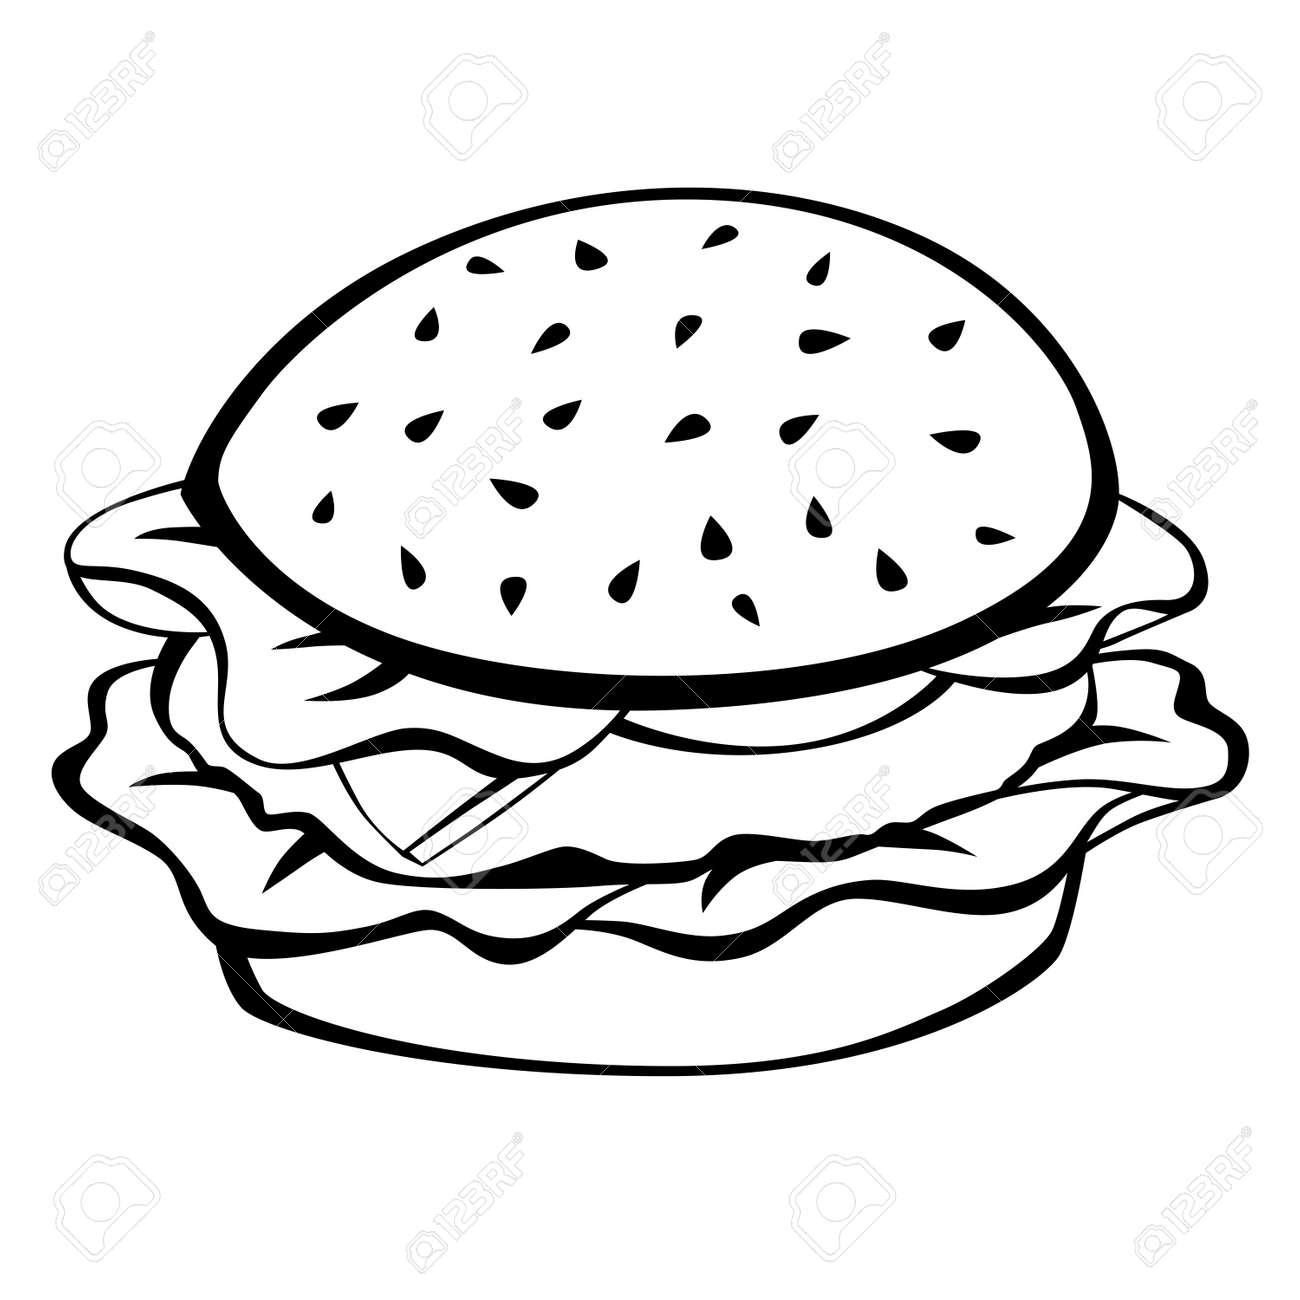 Black white hamburger food isolated illustration vector